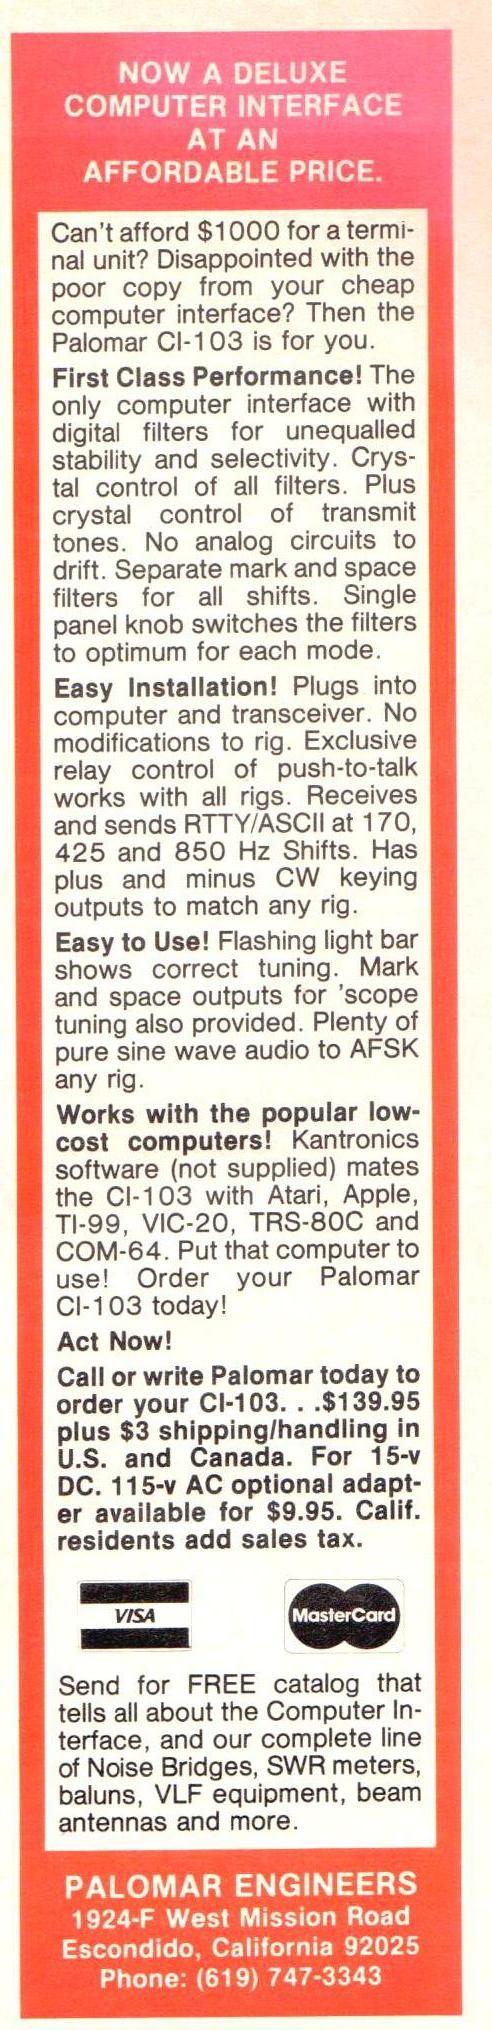 CI 103 Ad - CI-103 Computer Interface